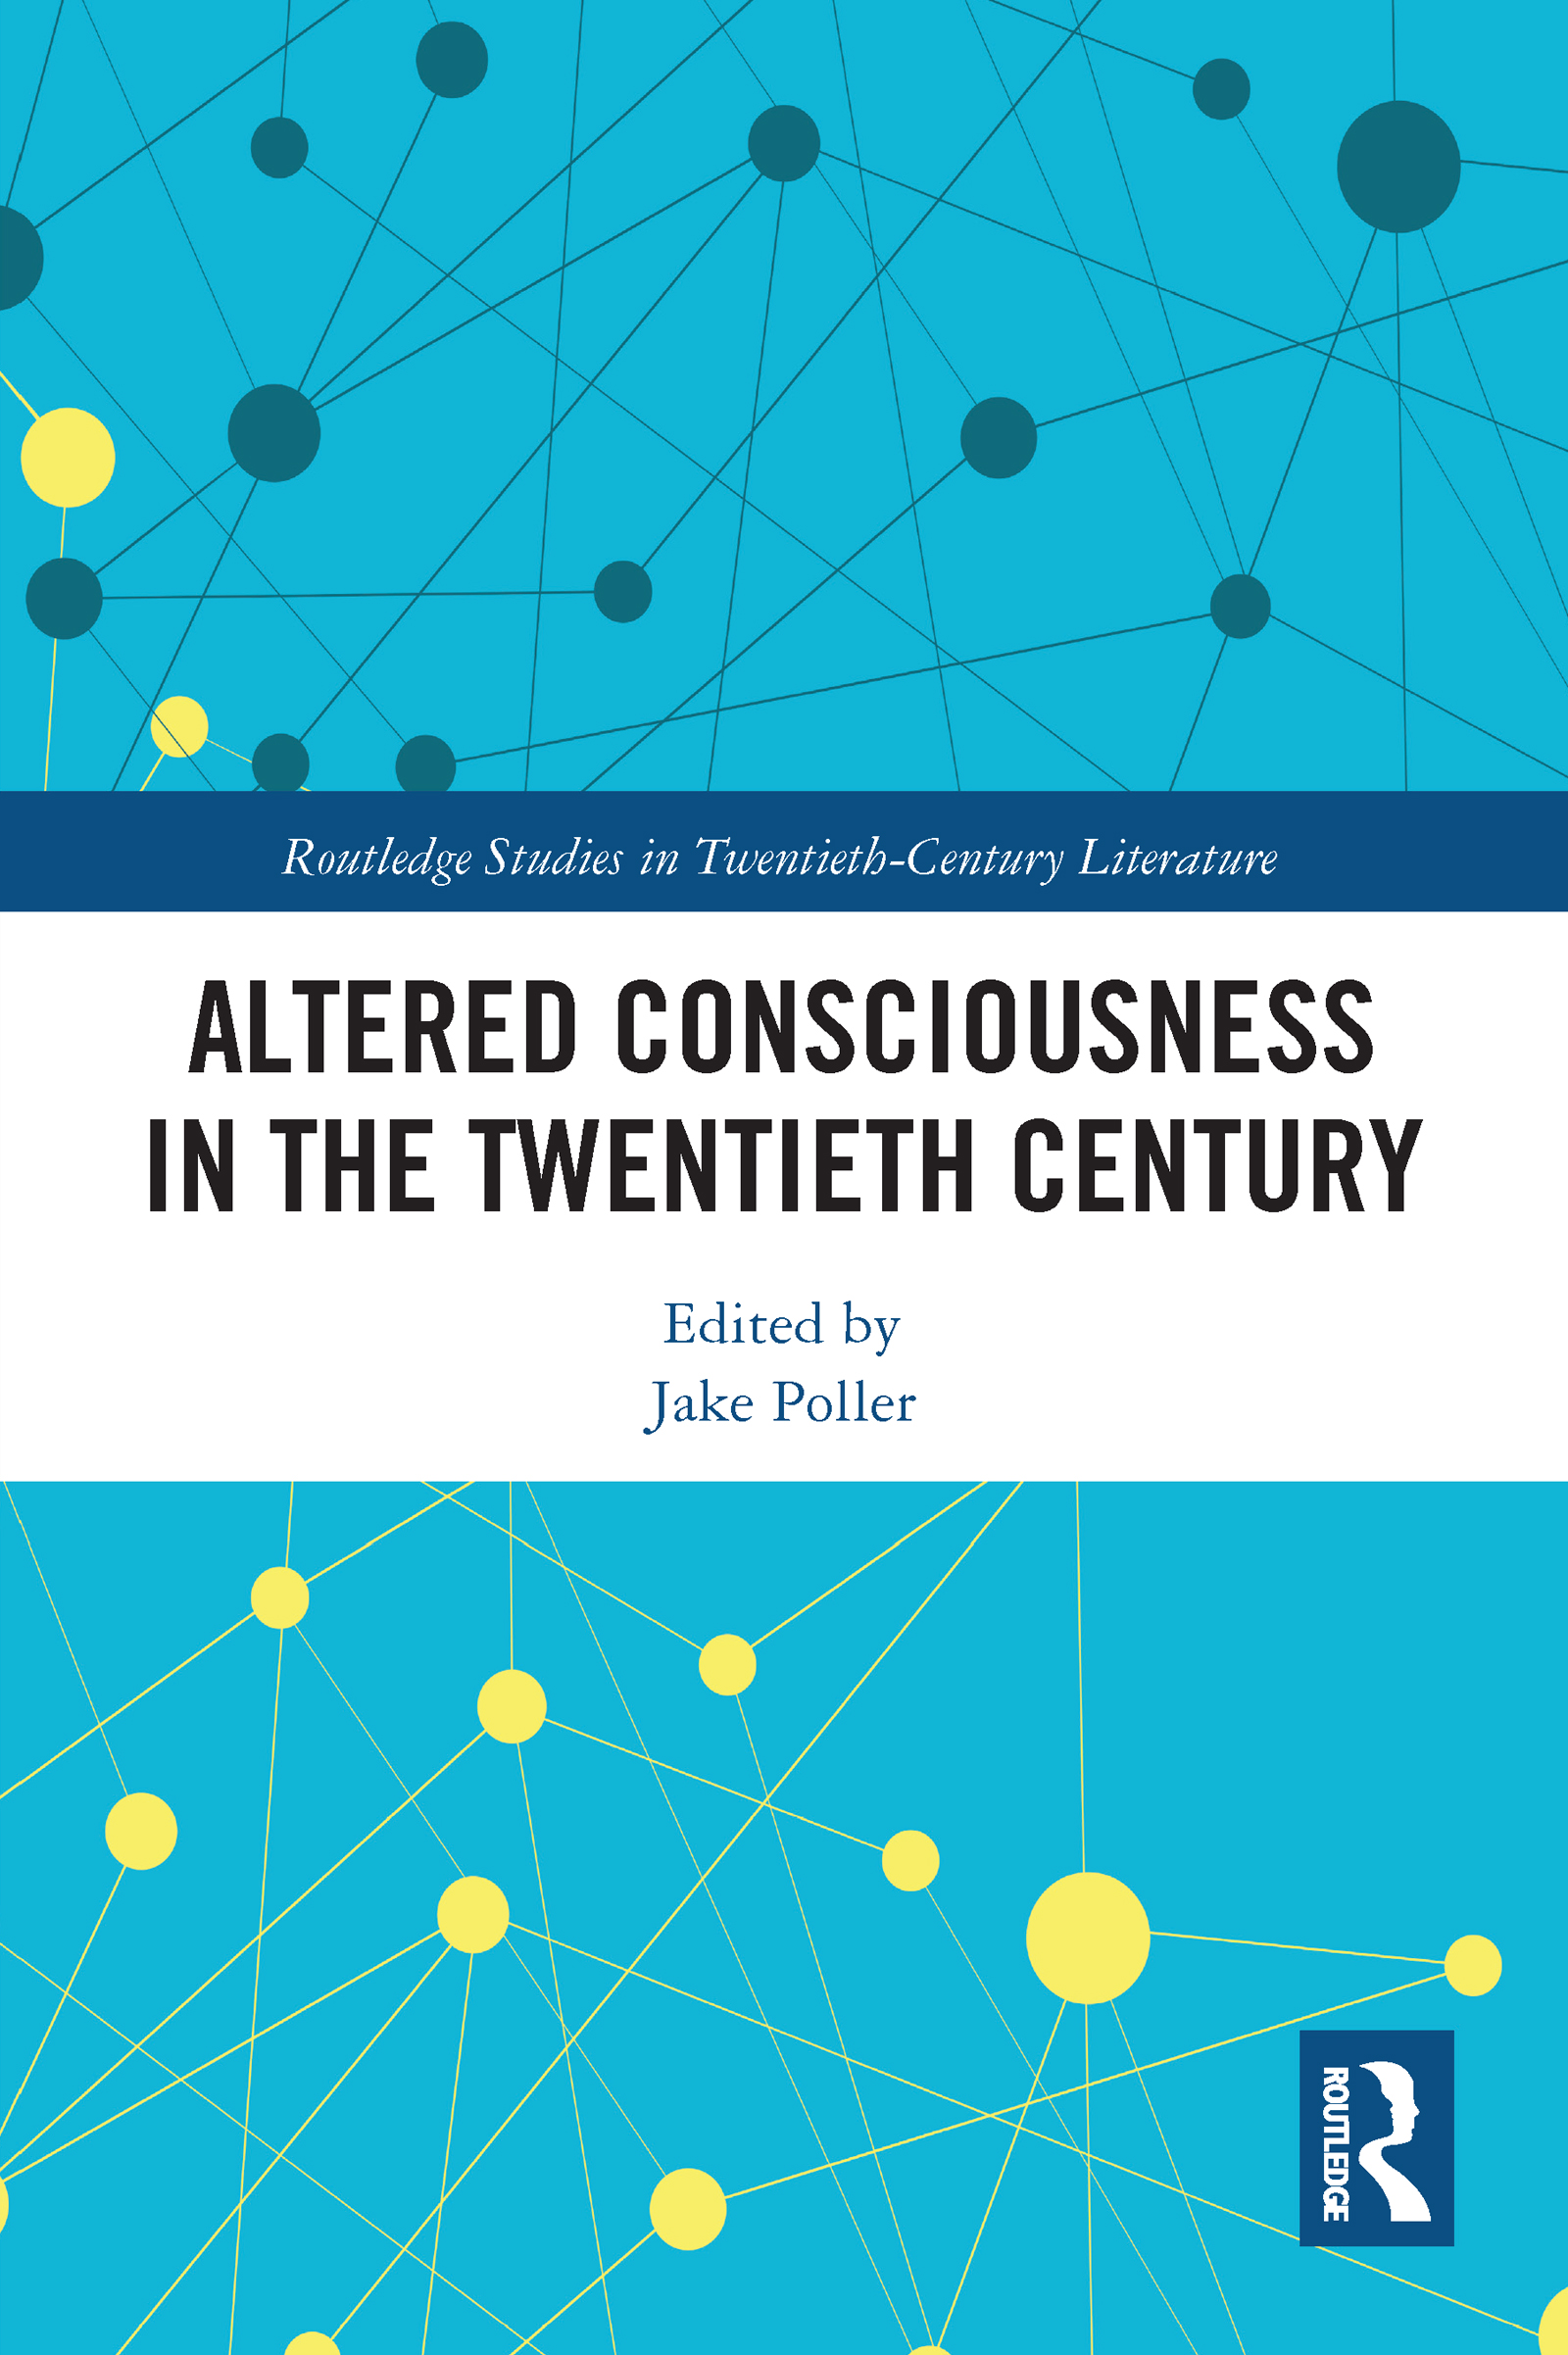 Altered Consciousness in the Twentieth Century